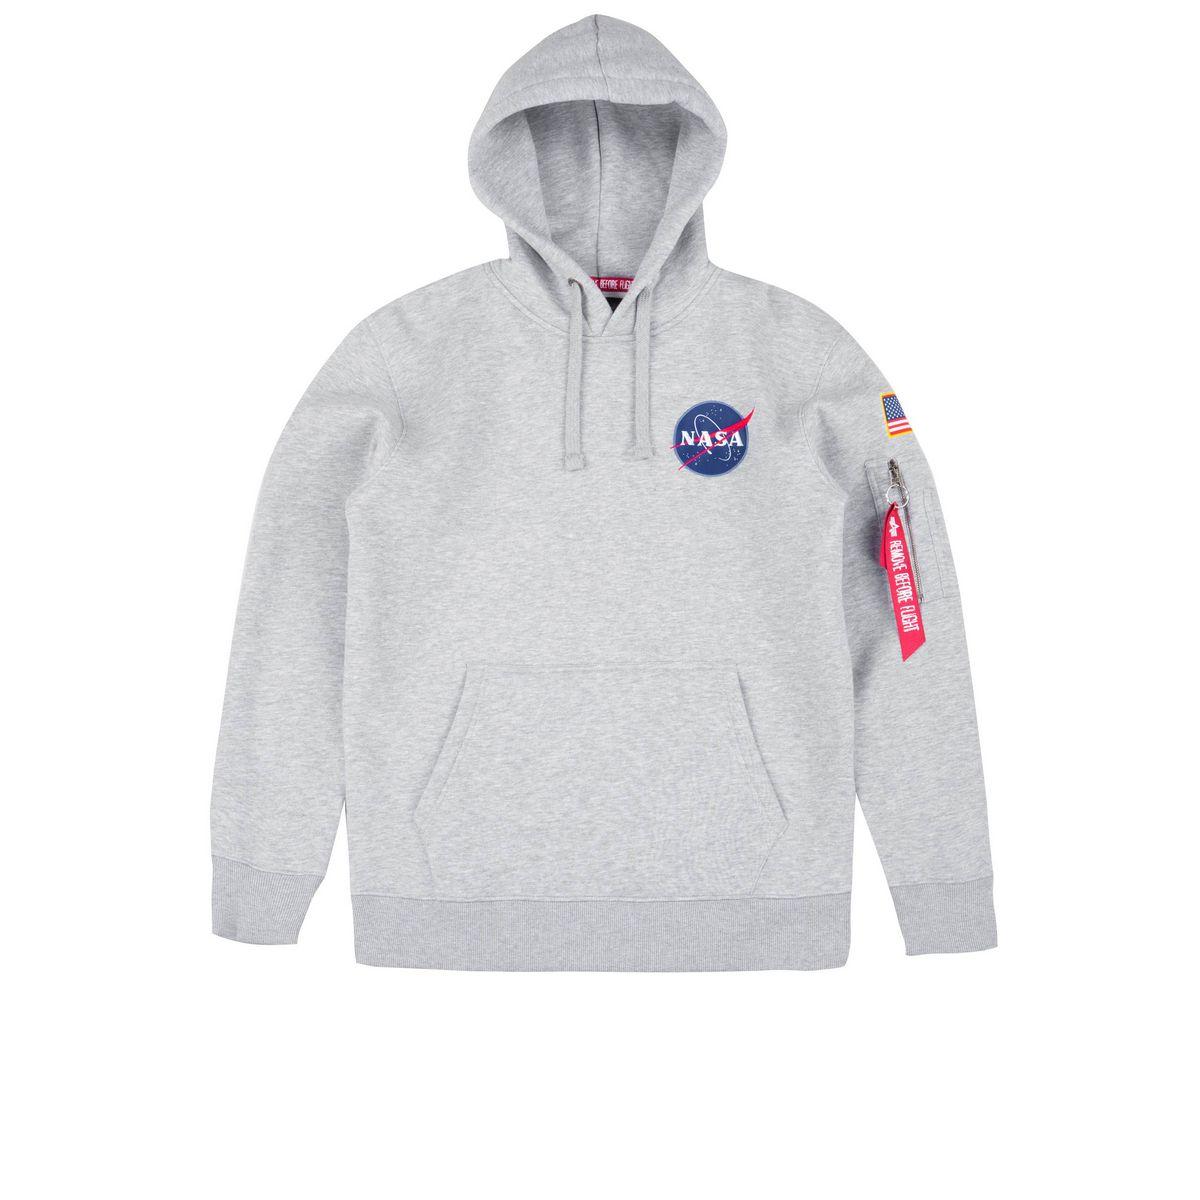 Alpha Industries Space Shuttle Hoody Hoodies Sweatshirts Grey Heather